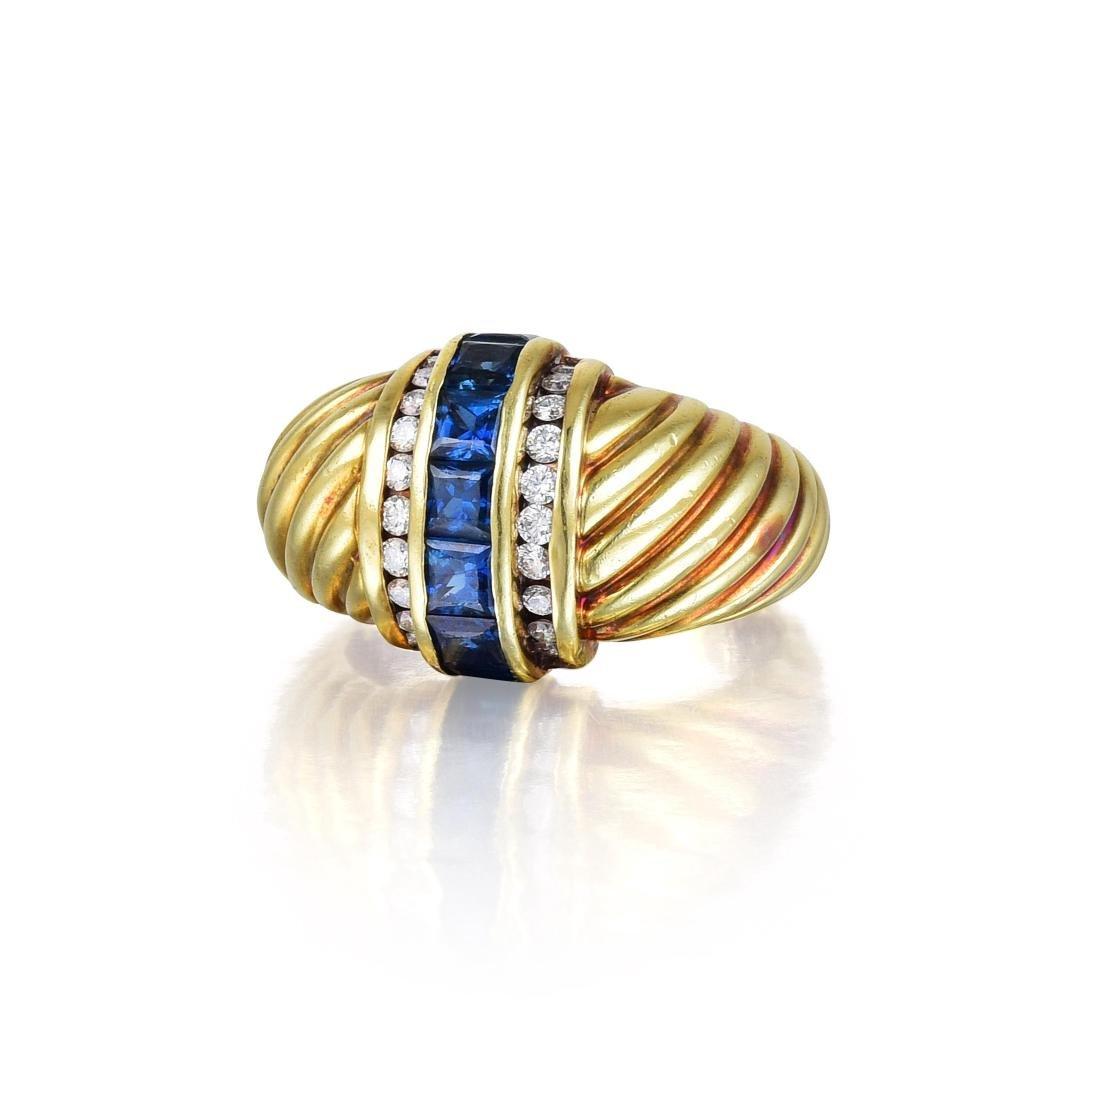 David Yurman Diamond and Sapphire Ring